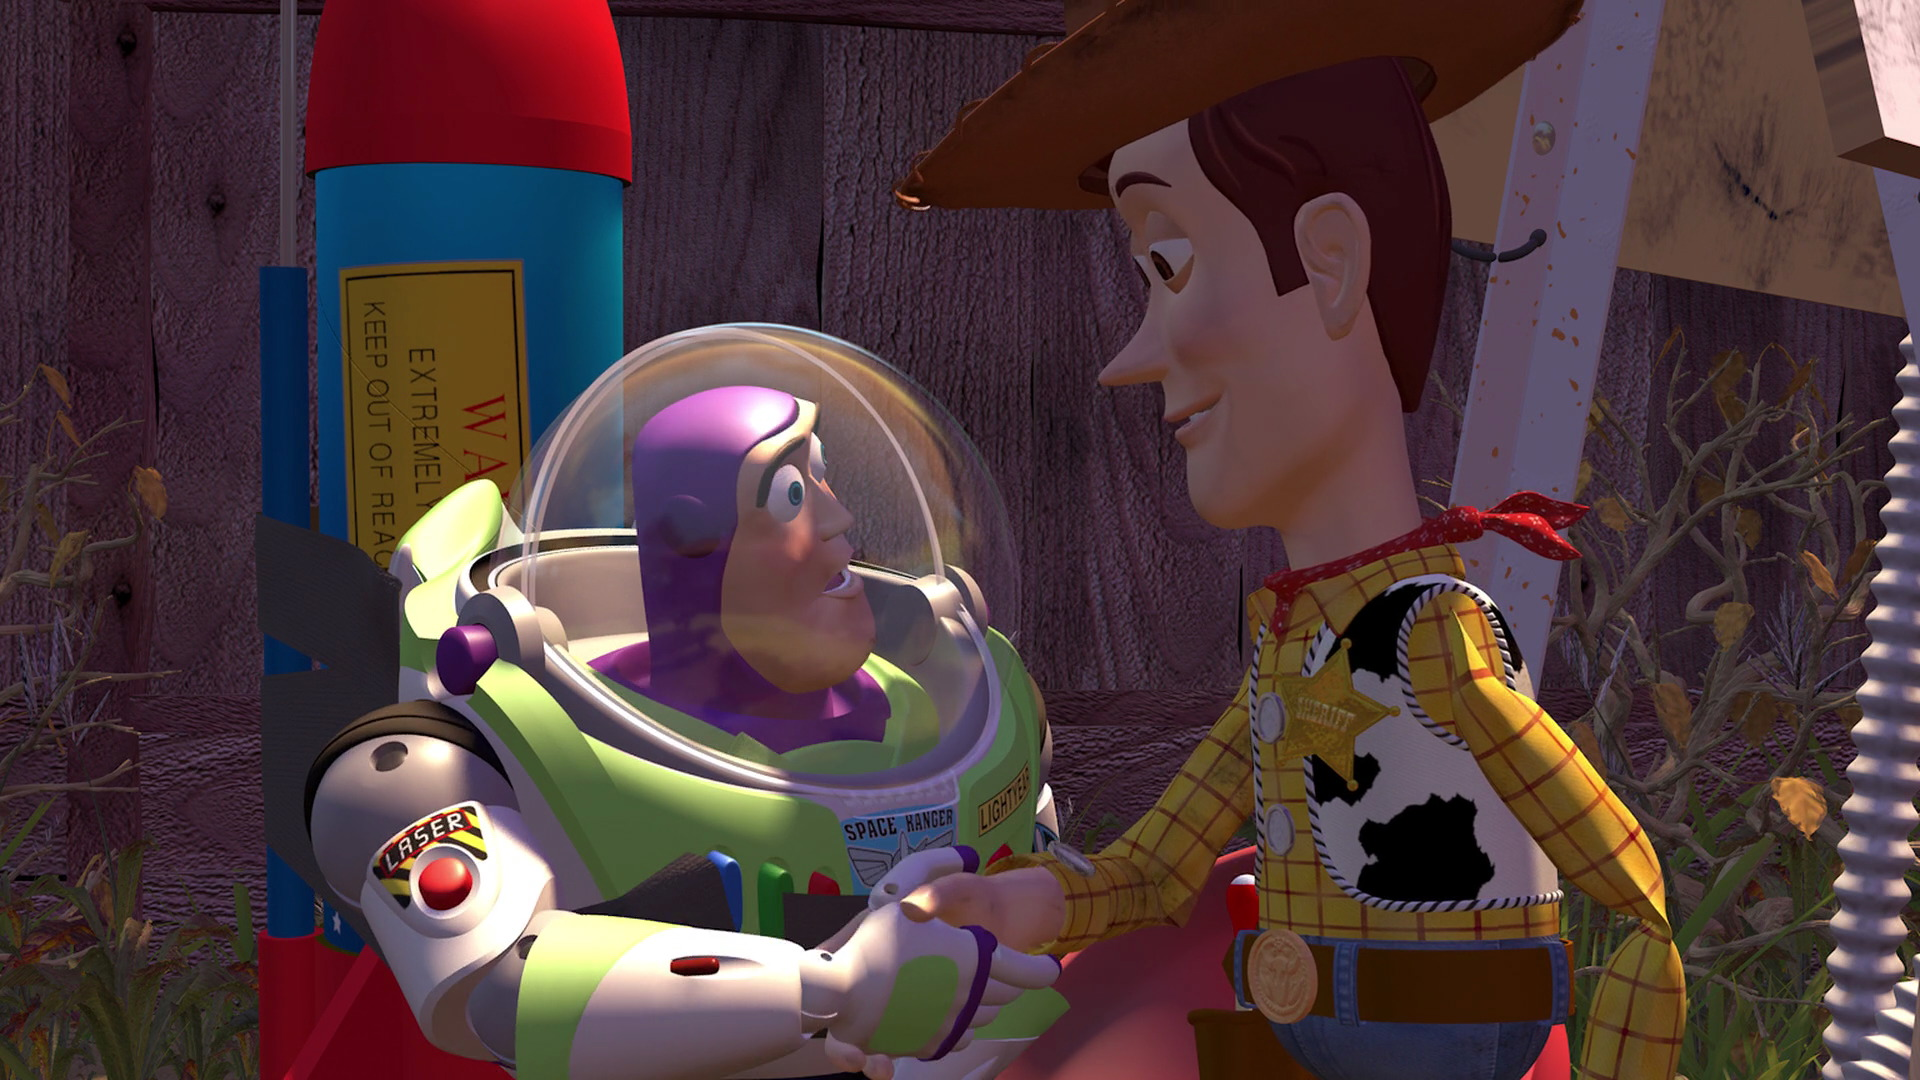 Buzz Lightyear/Relationships